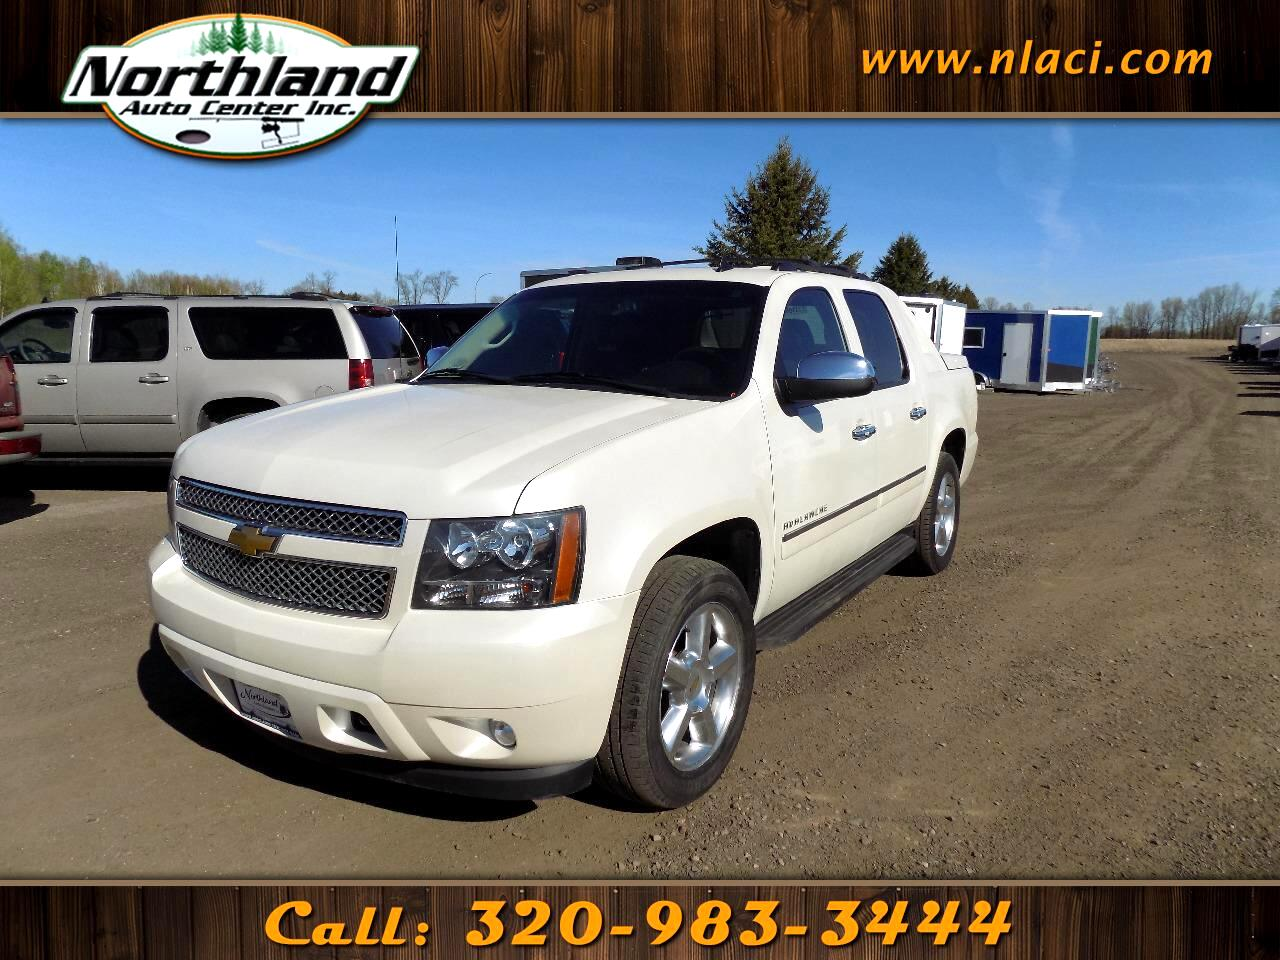 2013 Chevrolet Avalanche 4WD Crew Cab LTZ